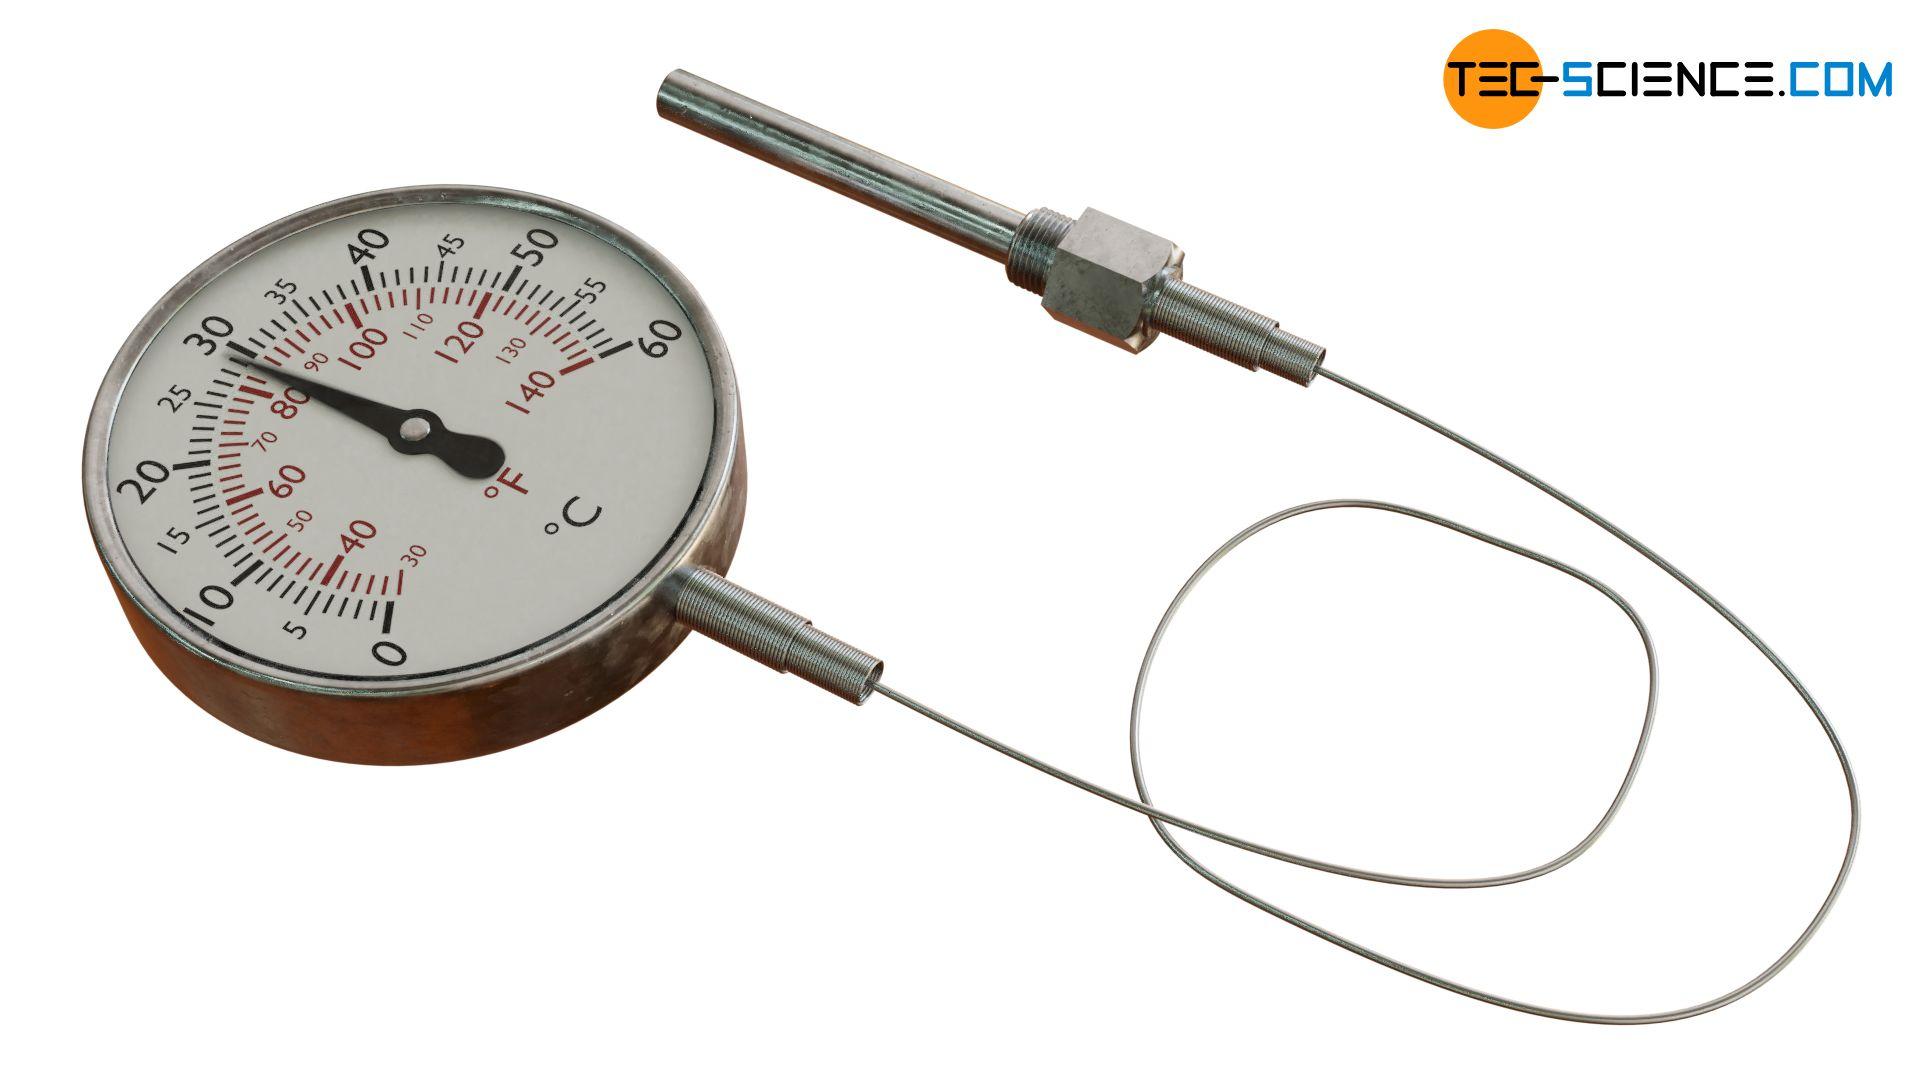 Gasdruck-Federthermometer mit flexibler Kapillarleitung